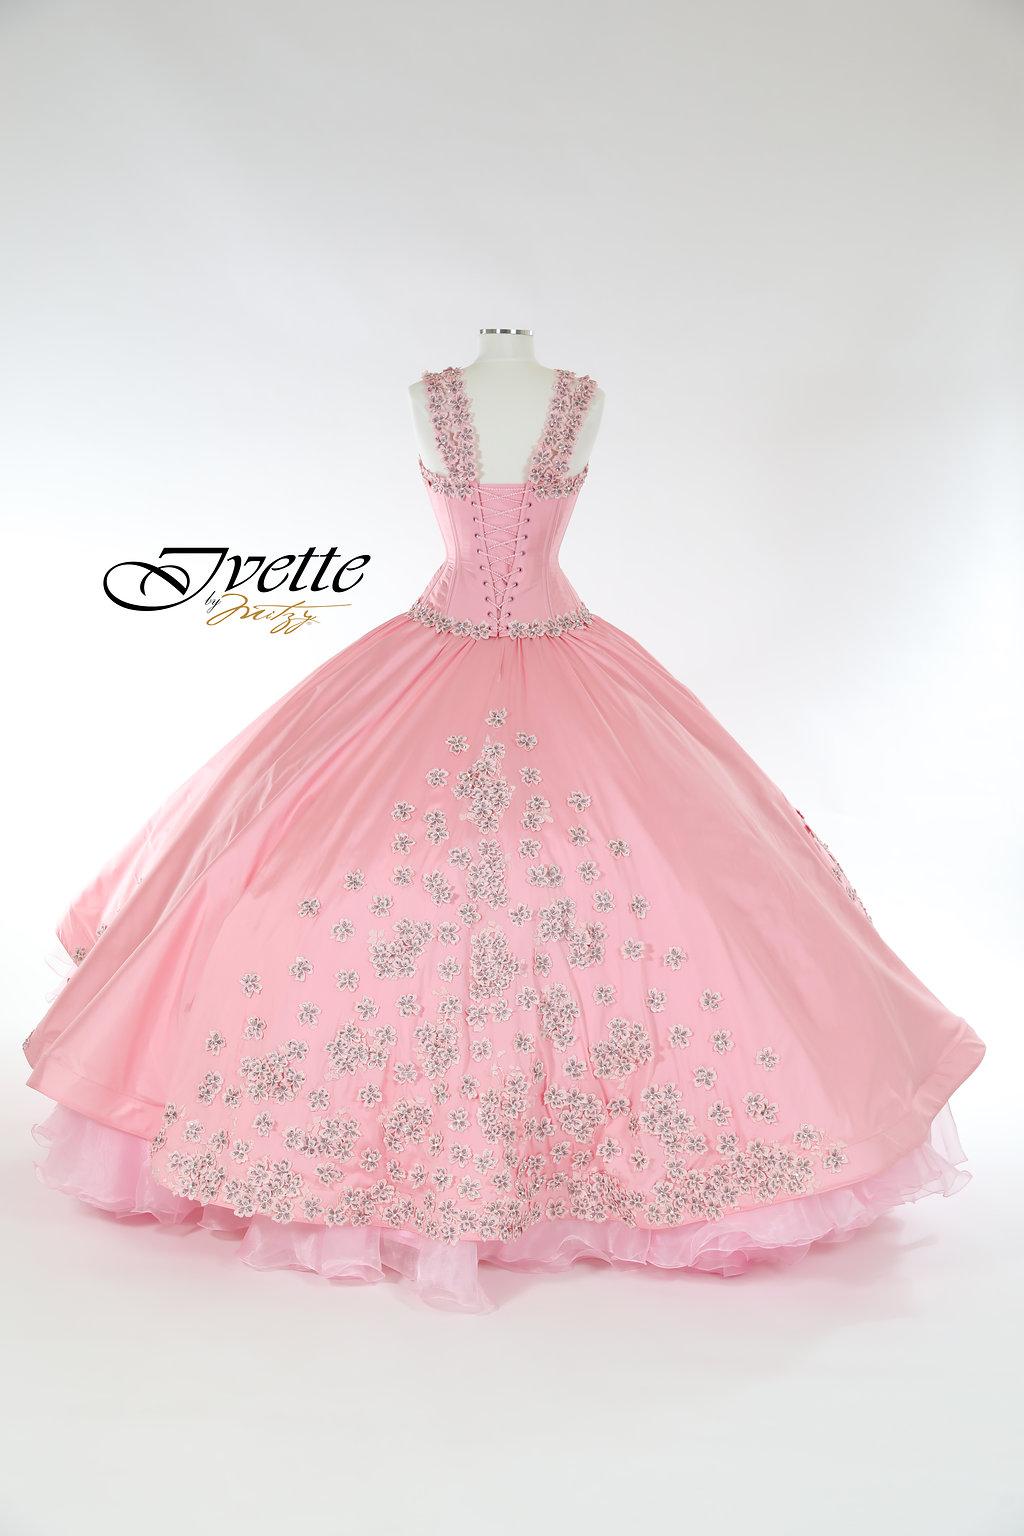 Ivette by Mitzy Quinceanera Dresses | Vestidos Charros XV